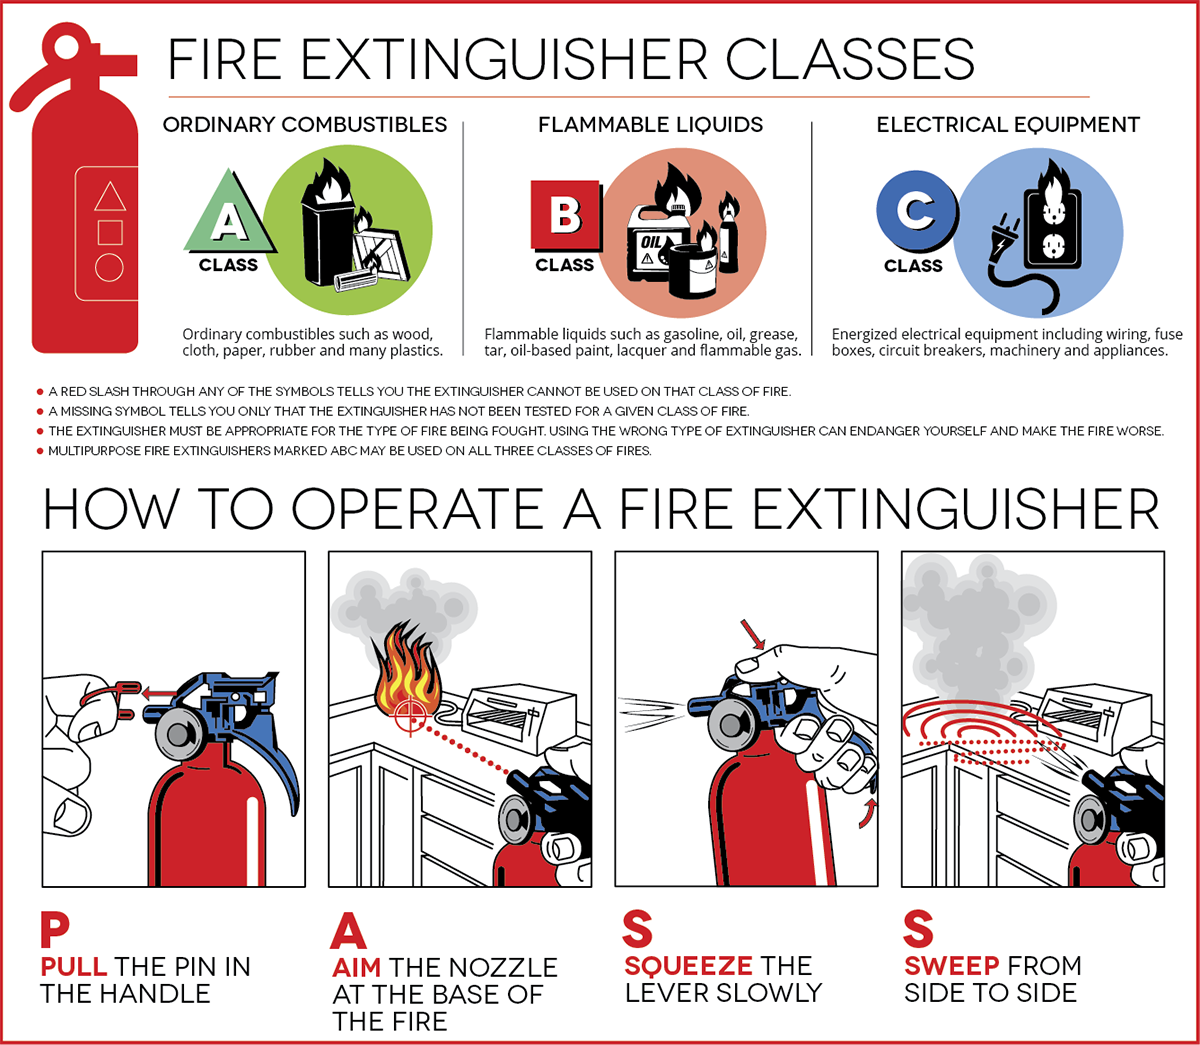 extinguisherinfo_graphic.ashx?la=en portable fire extinguishers  at nearapp.co